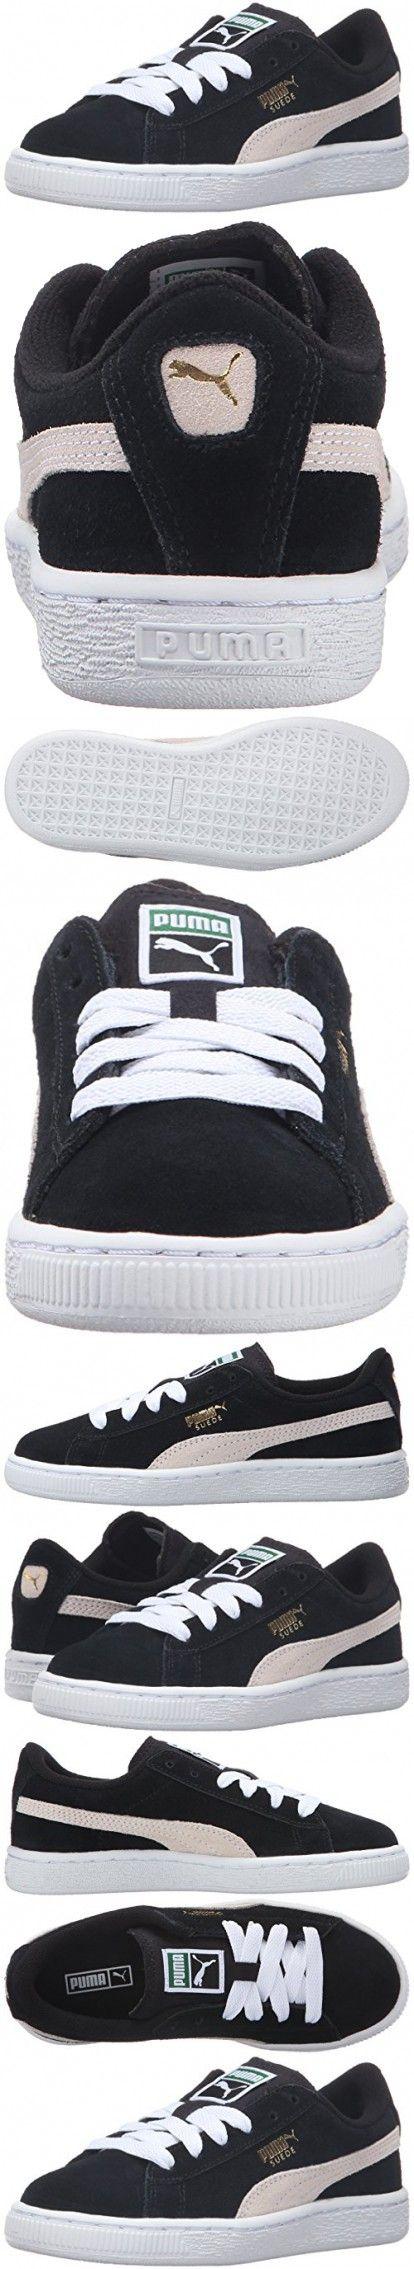 PUMA Suede PS Classic Kids Sneaker (Toddler/ Little Kid/ Big Kid), Black/ White, 2.5 M US Little Kid